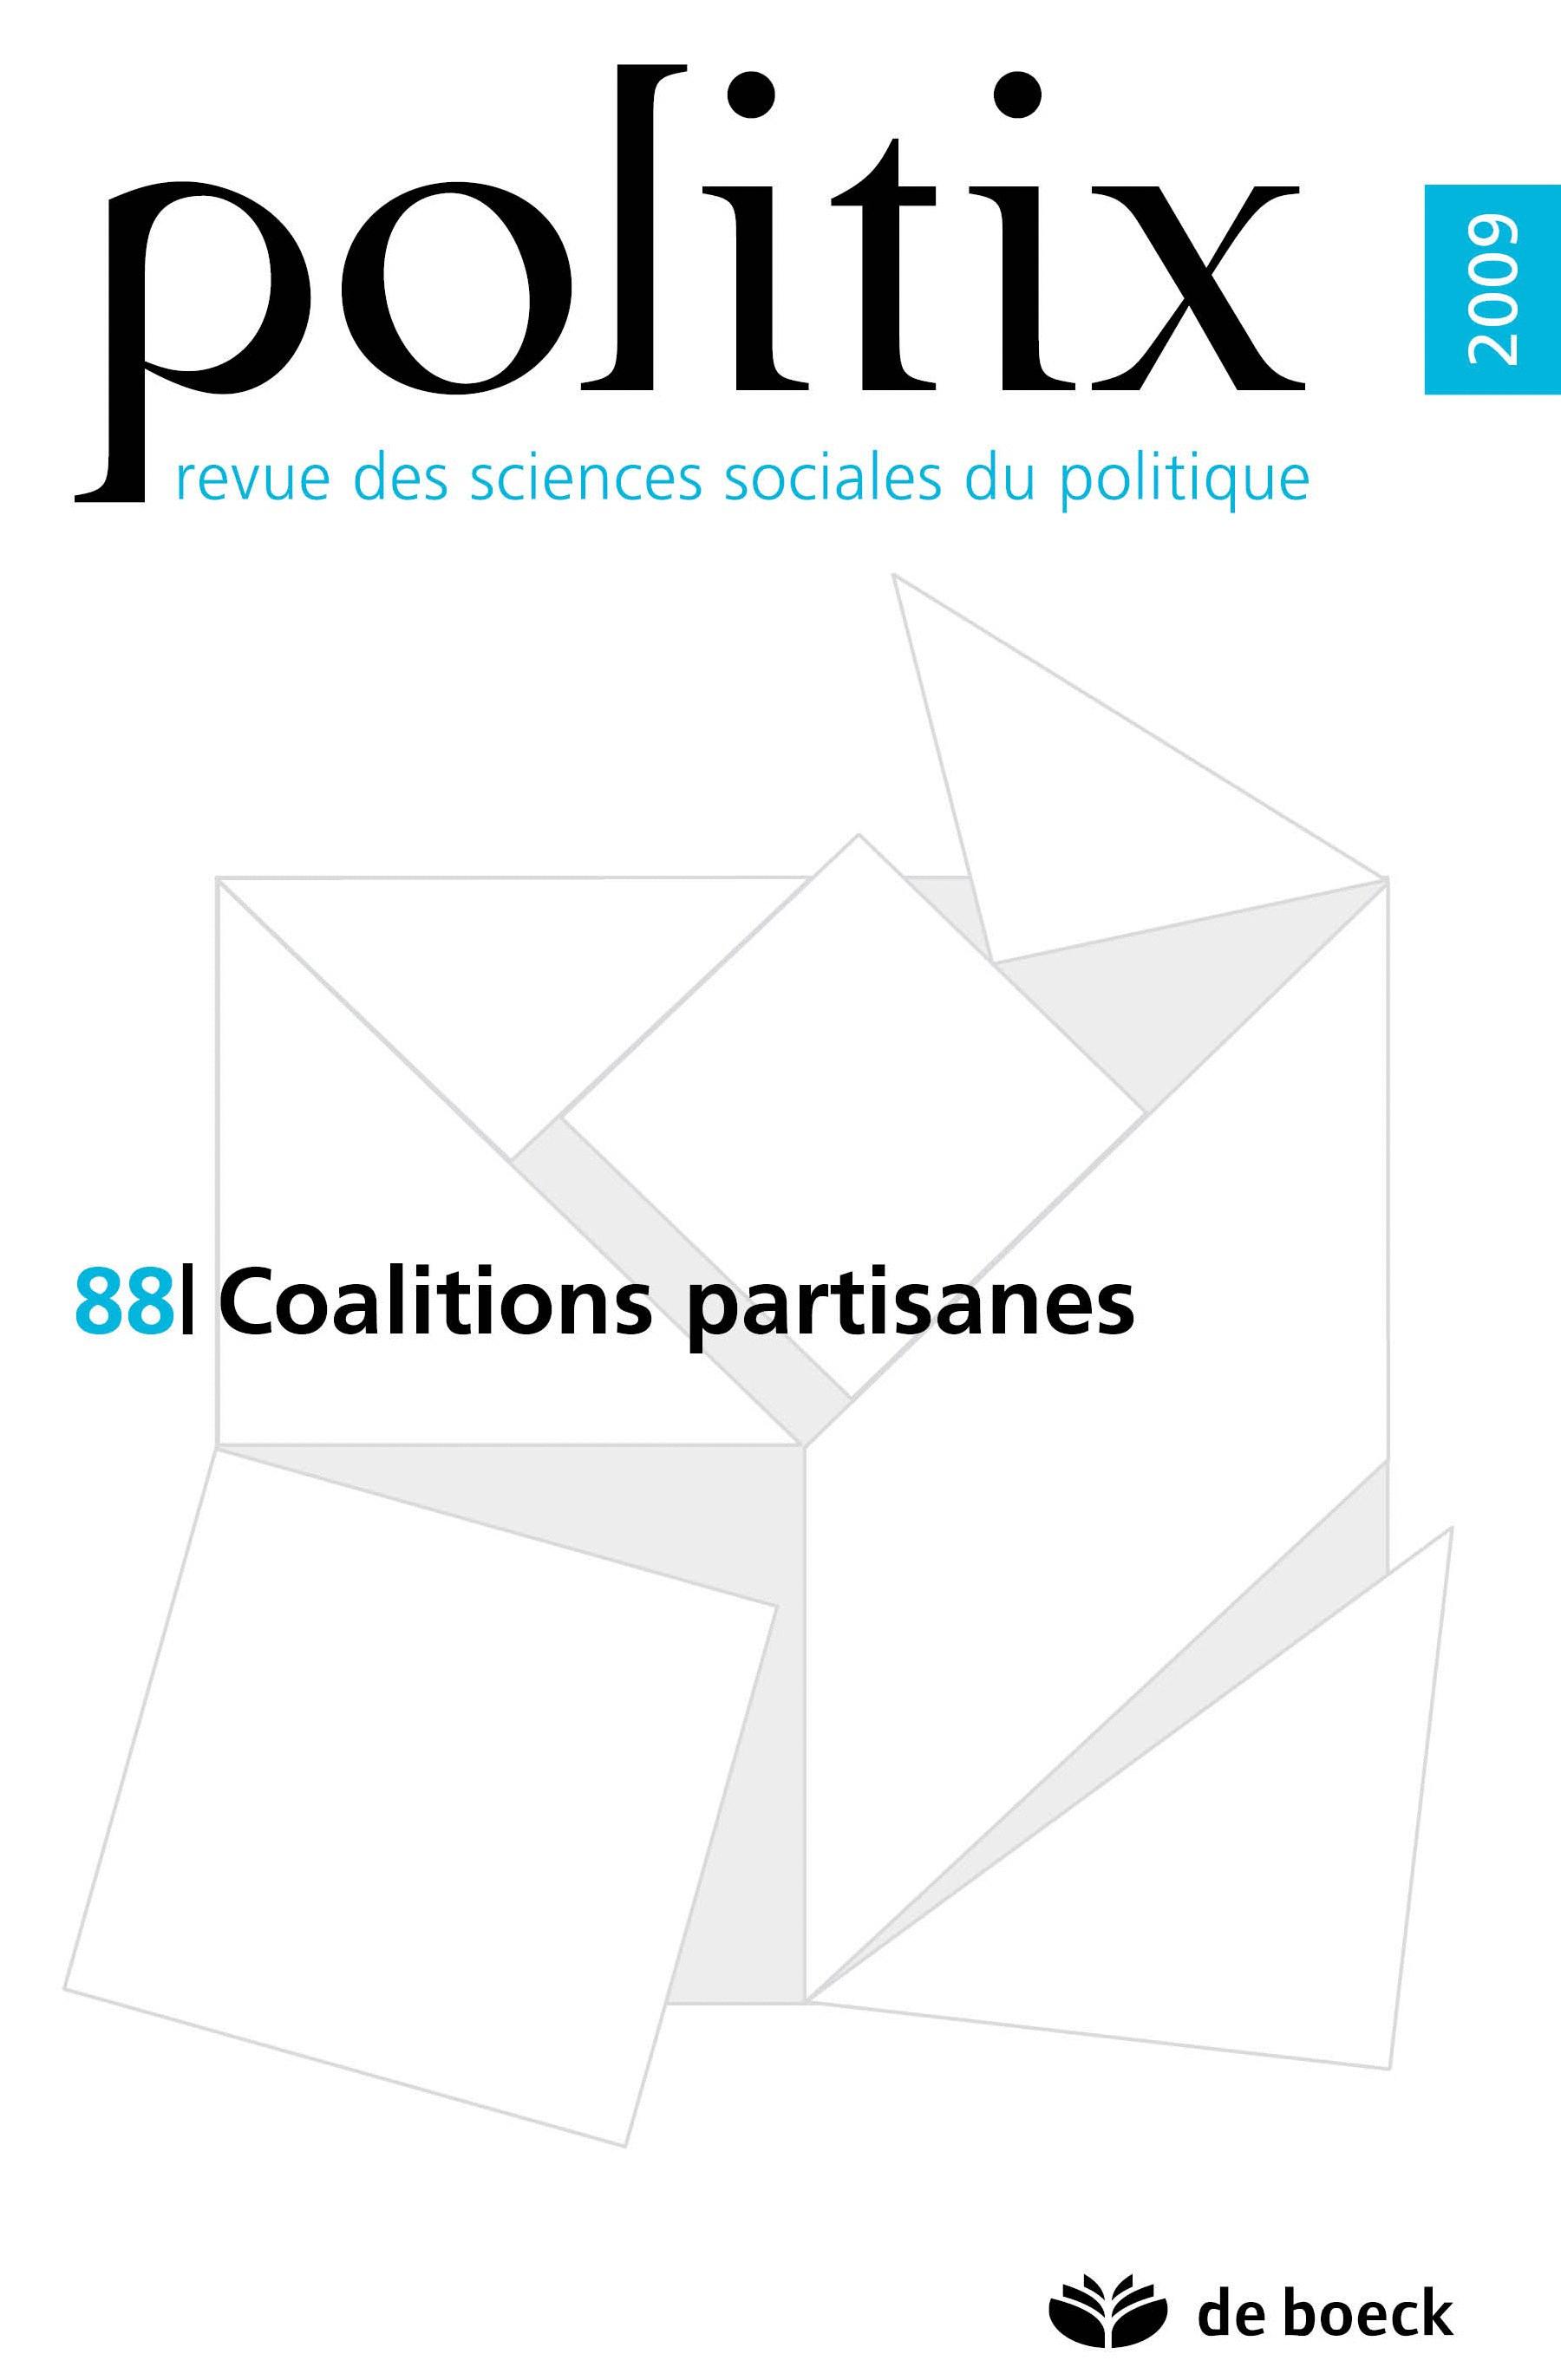 POLITIX 2009/4 N.88 COALITIONS PARTISANES